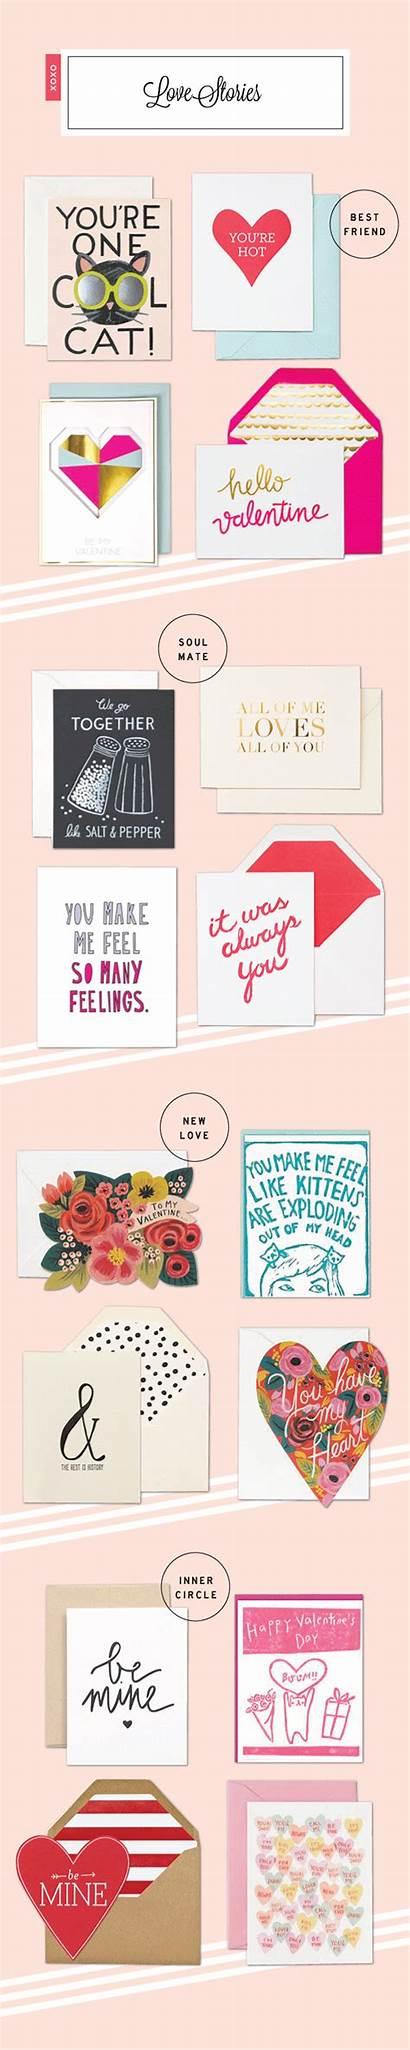 Urbanic Valentine Few Favorites Stories